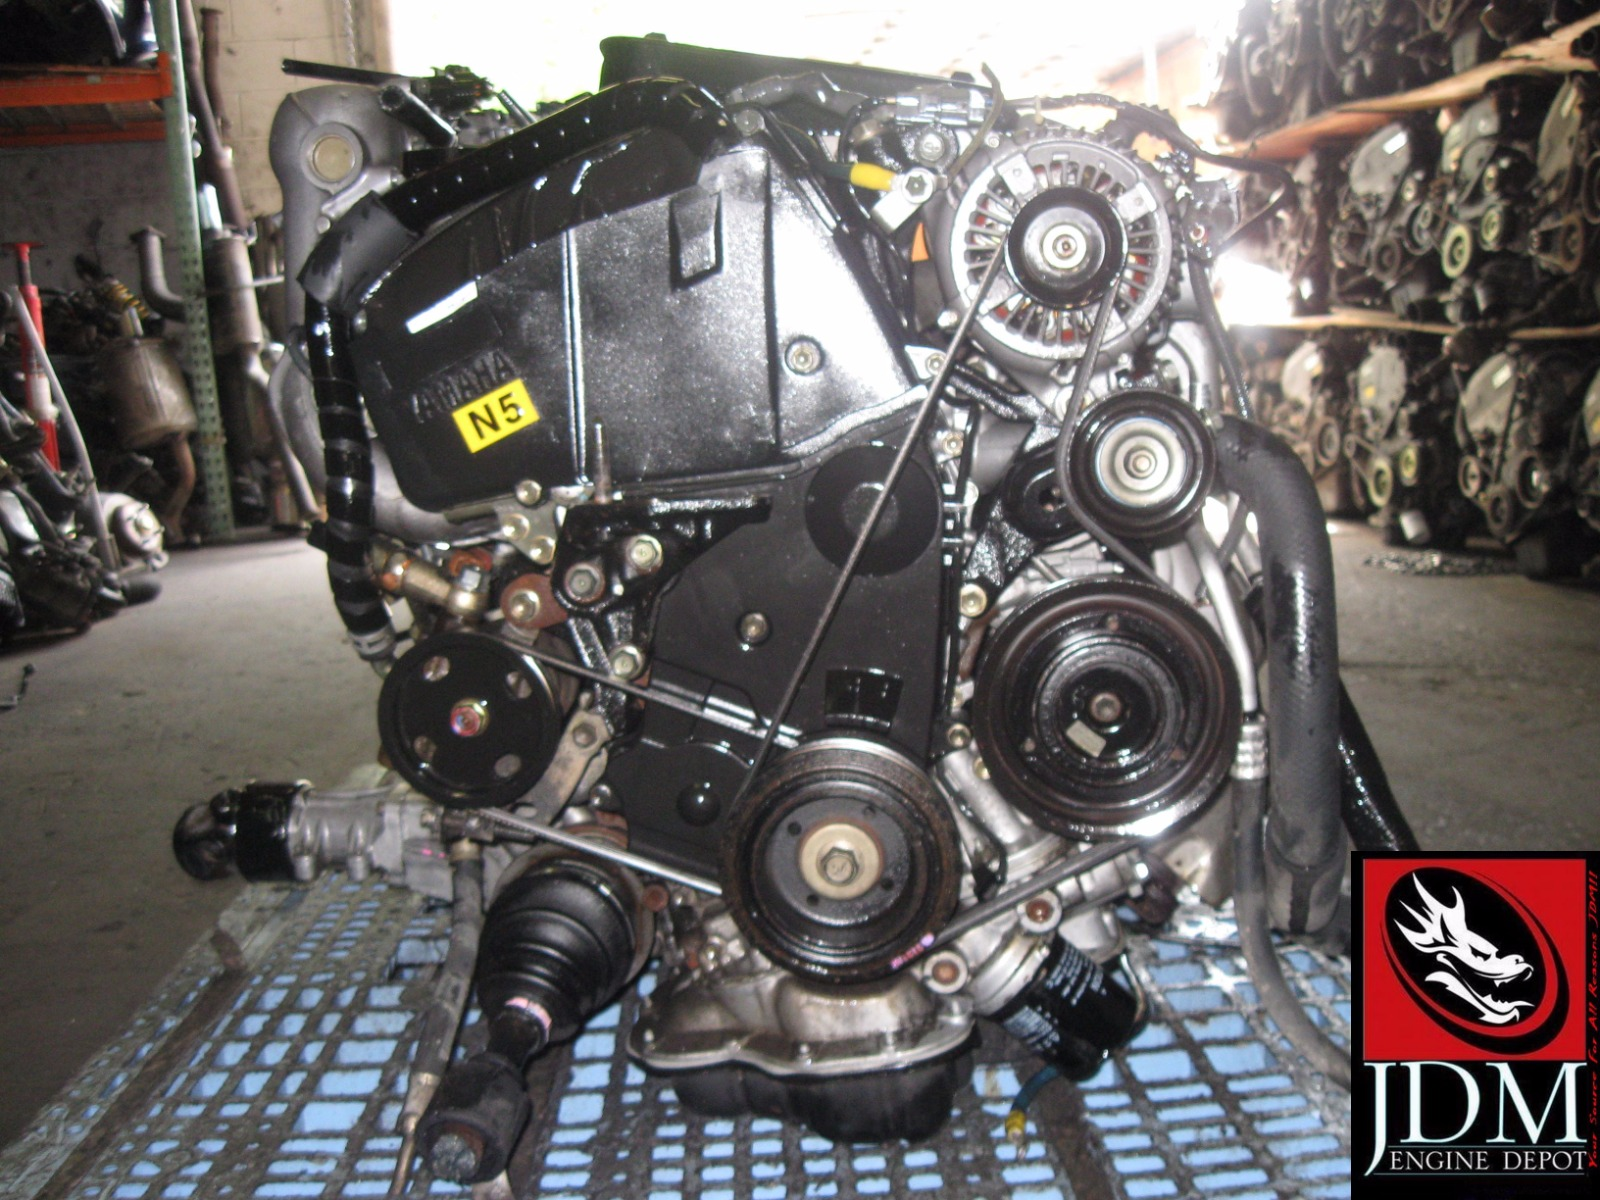 98 03 toyota caldina st215 2 0l turbo engine transmission wiring 98 03 toyota caldina st215 2 0l turbo engine transmission wiring ecu jdm 3sgte